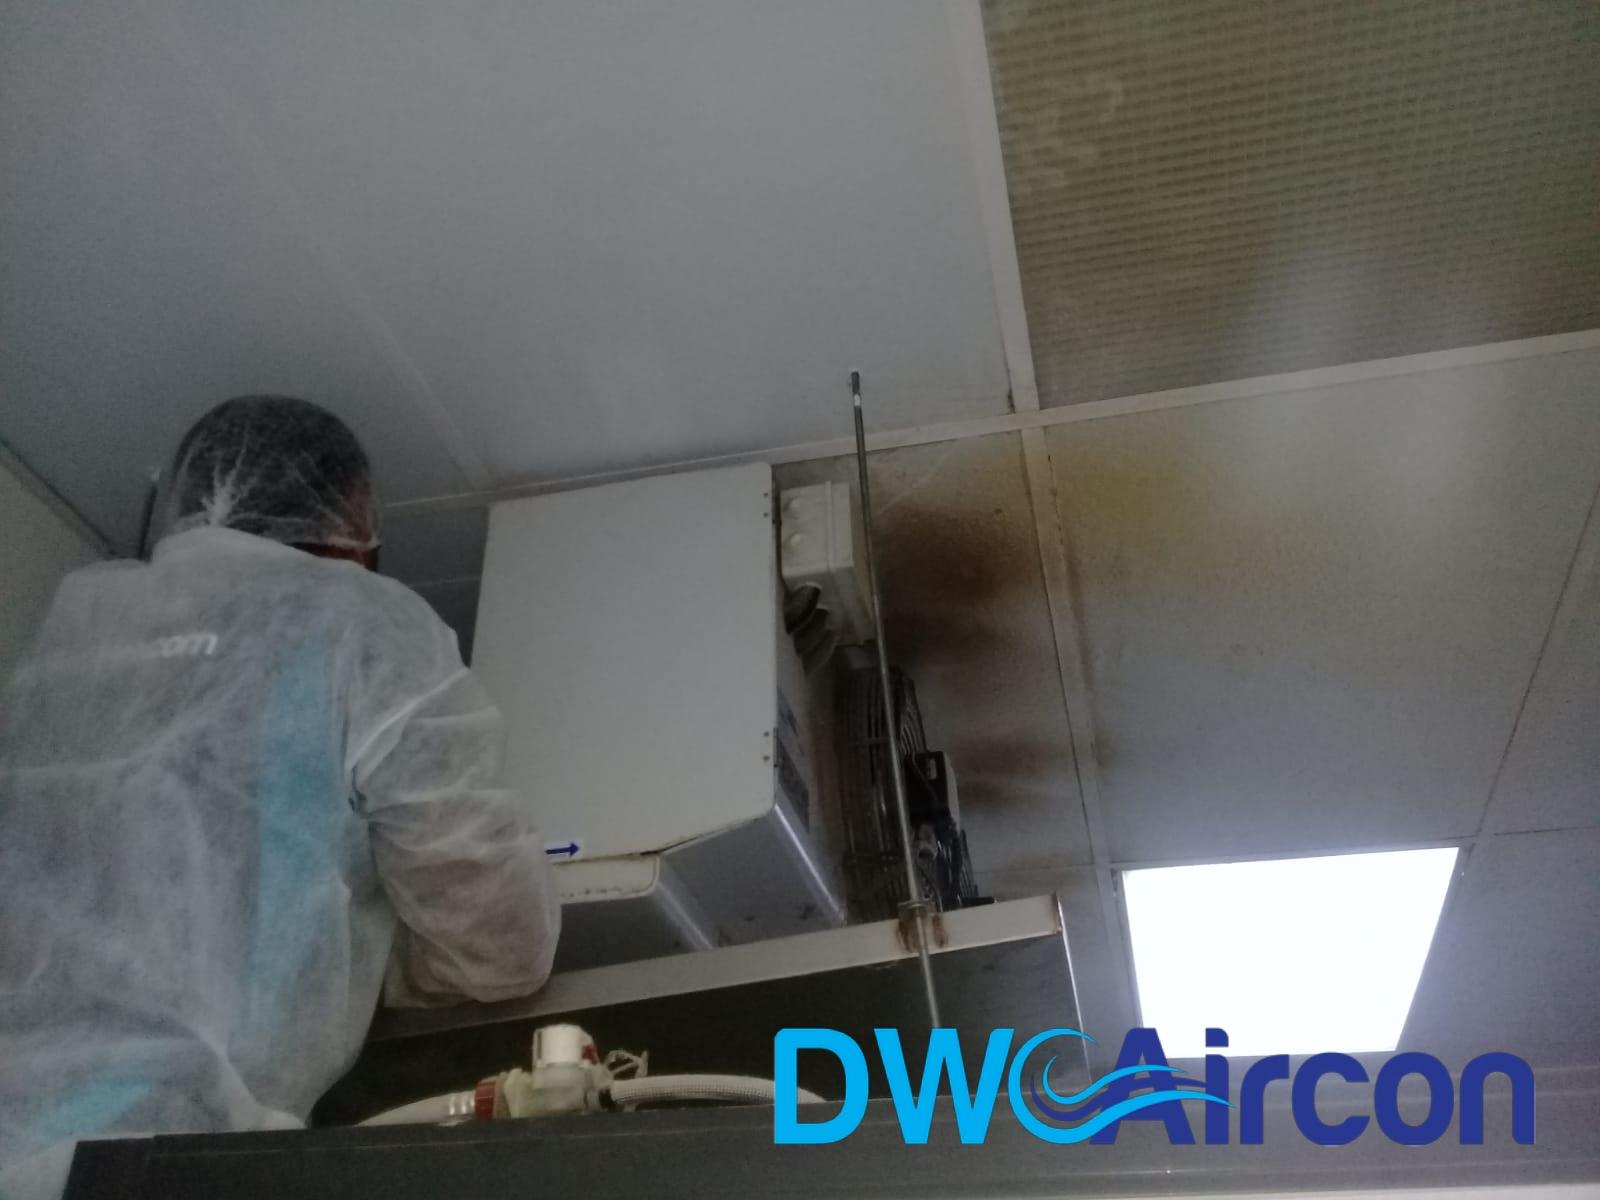 aircon-maintenance-commercial-kitchen-office-tai-seng-dw-aircon-servicing-singapore_wm